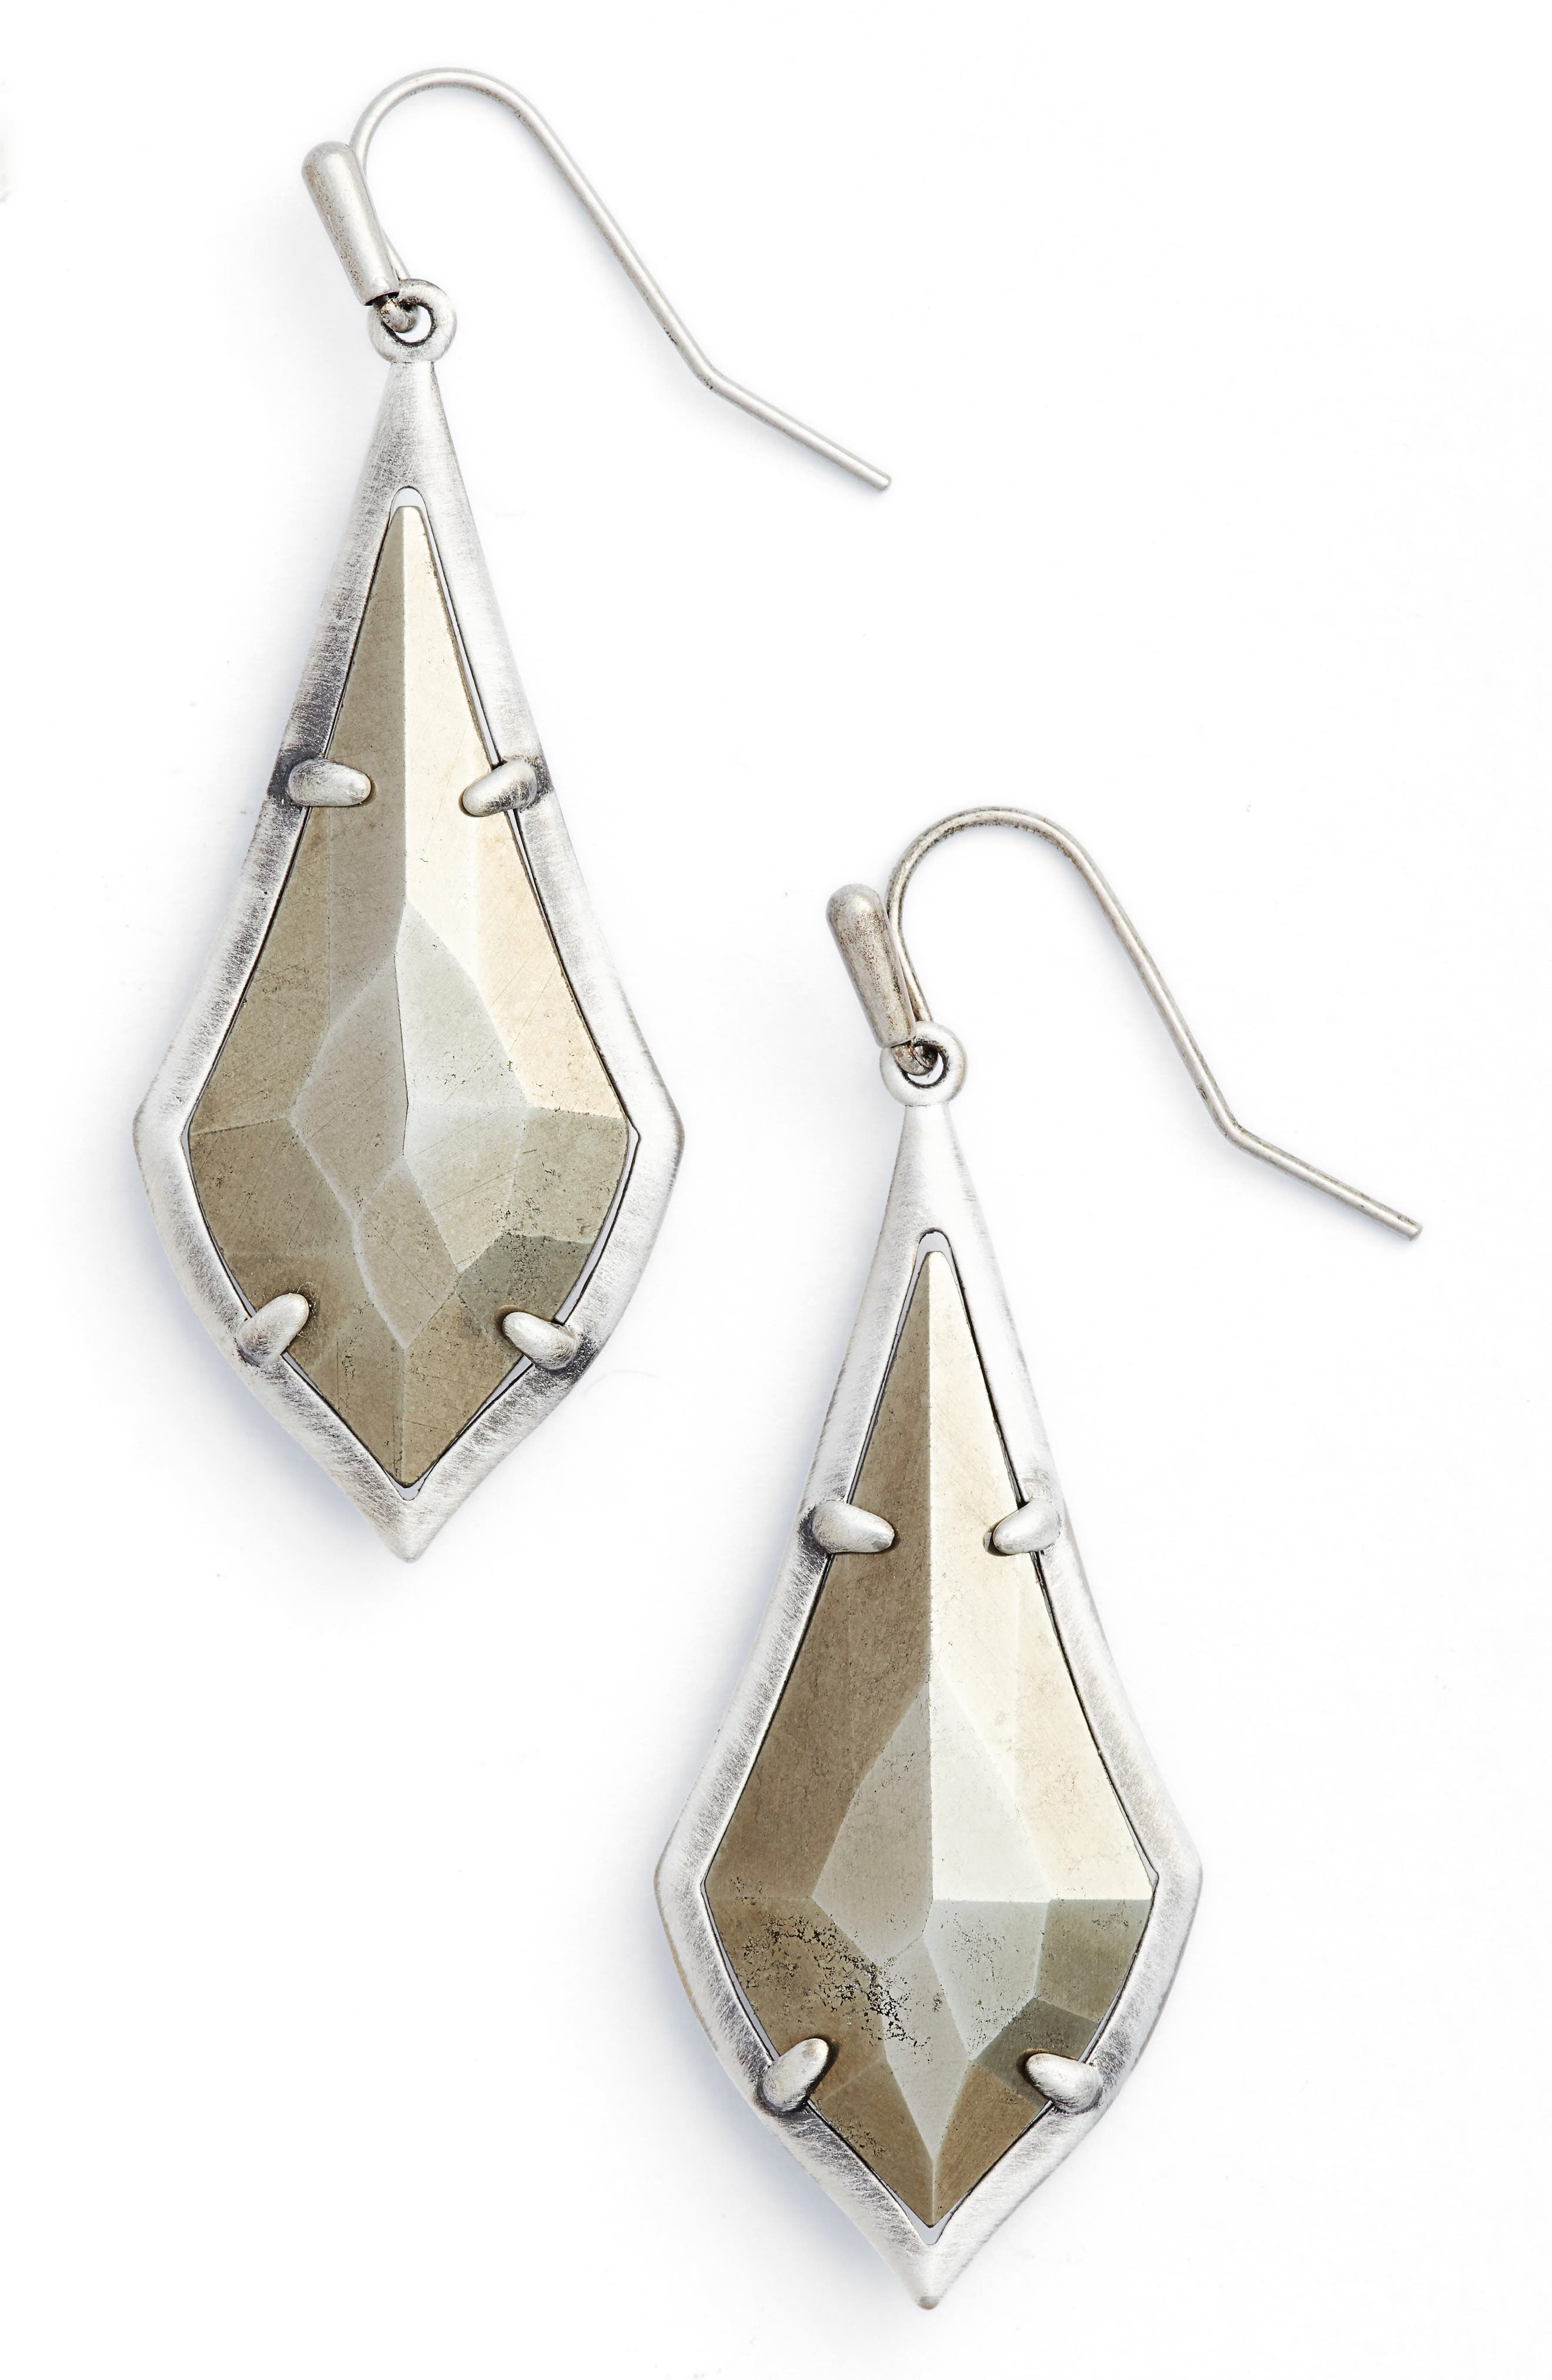 Olivia Drop Earrings,                             Main thumbnail 1, color,                             040